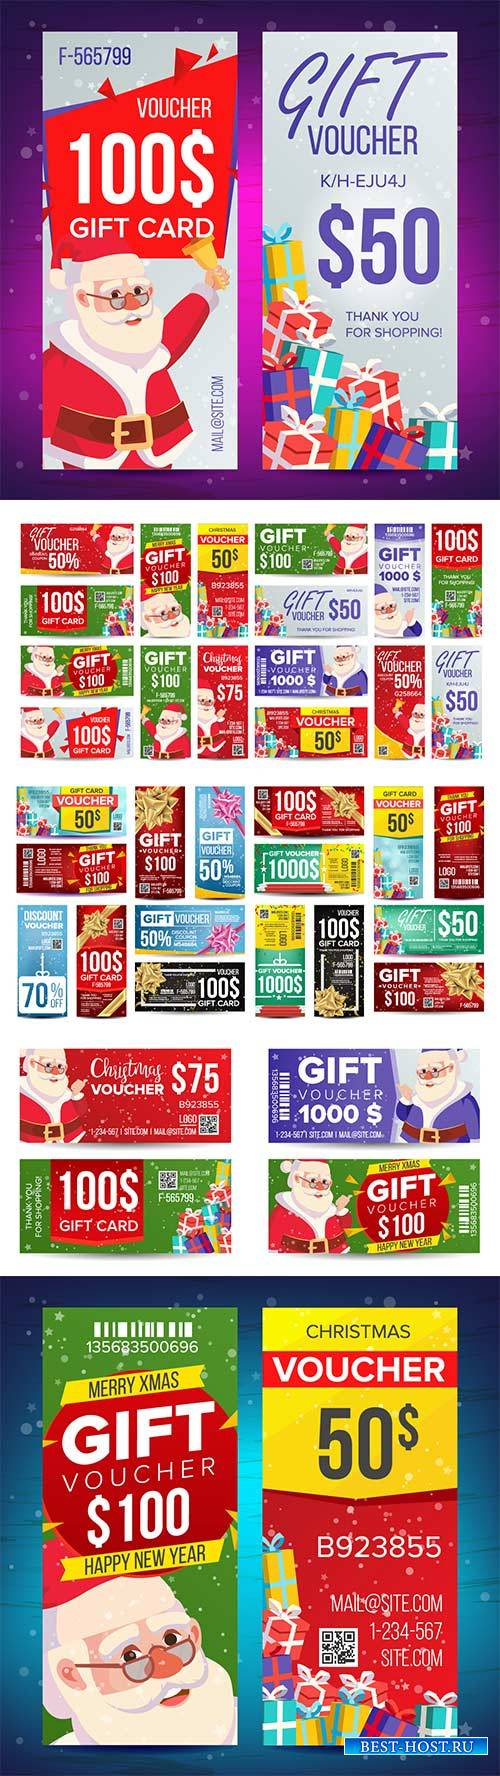 Merry Christmas voucher gift design vector set, Santa